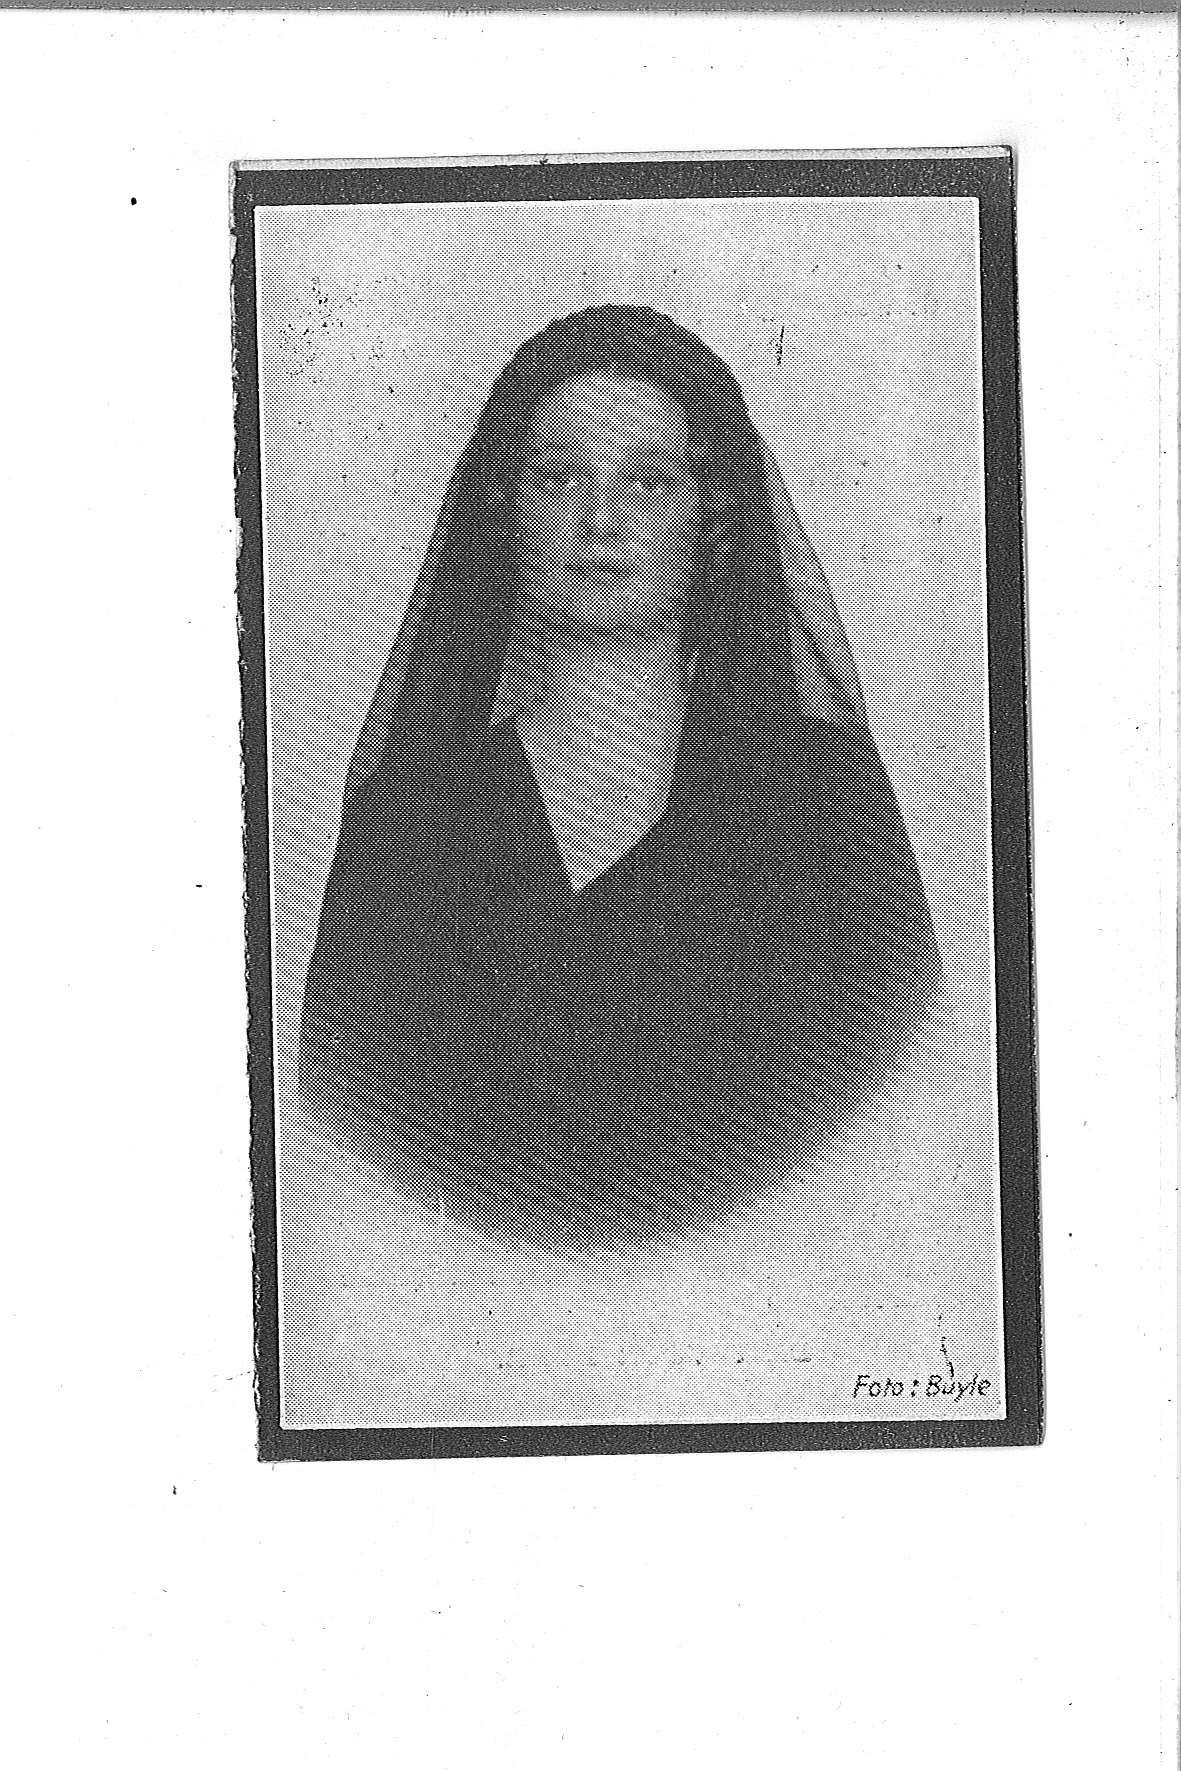 Astrid-Sofia-Ludovica-Thyra(1935)20120614143819_00003.jpg